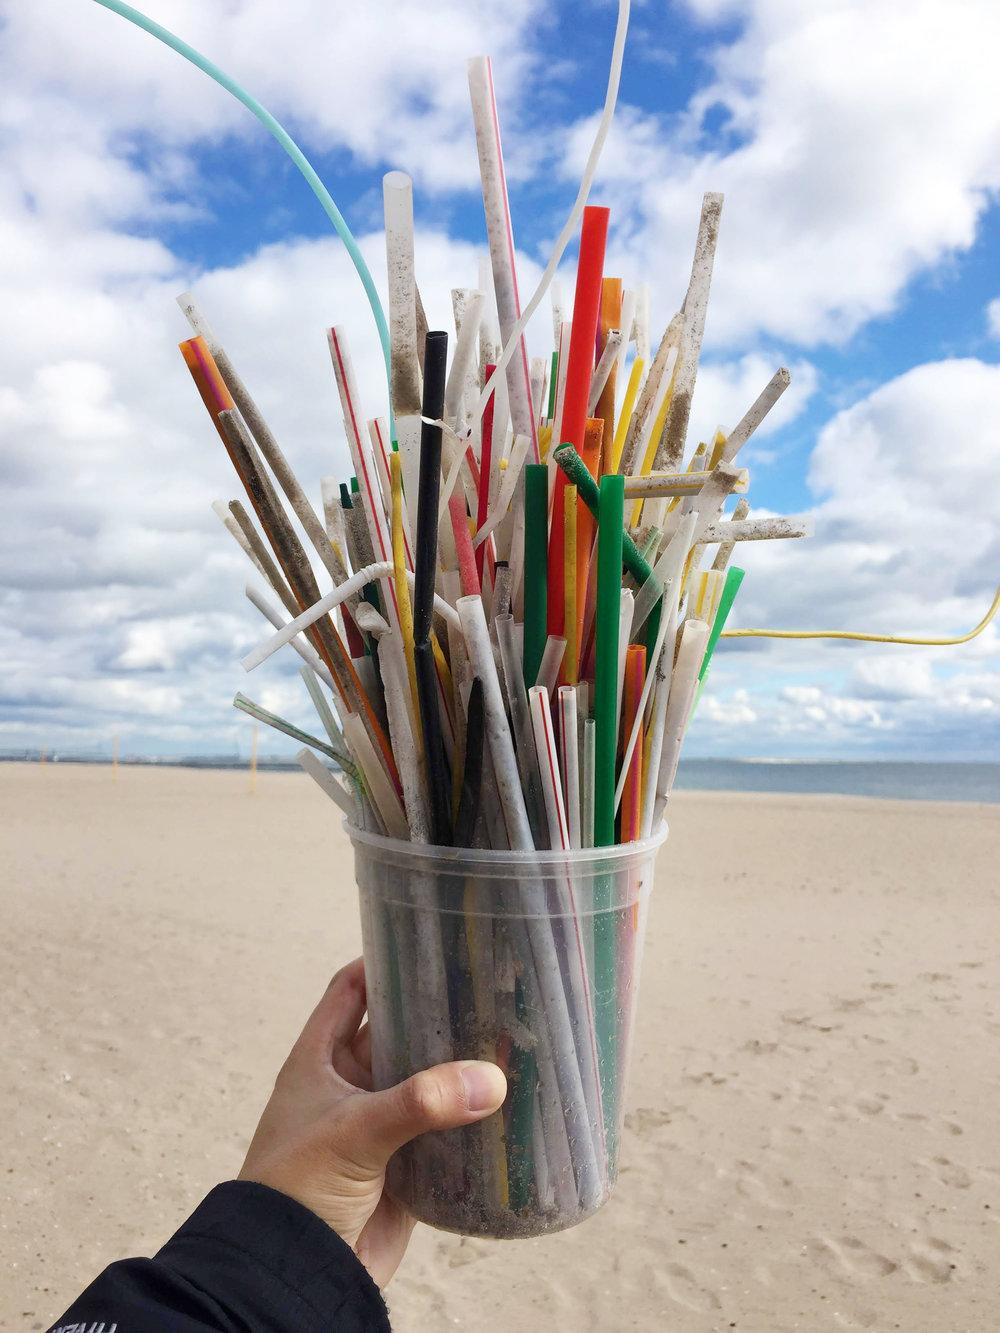 amy_chen_design_coney_island_beach_clean_up_straws_2.JPG